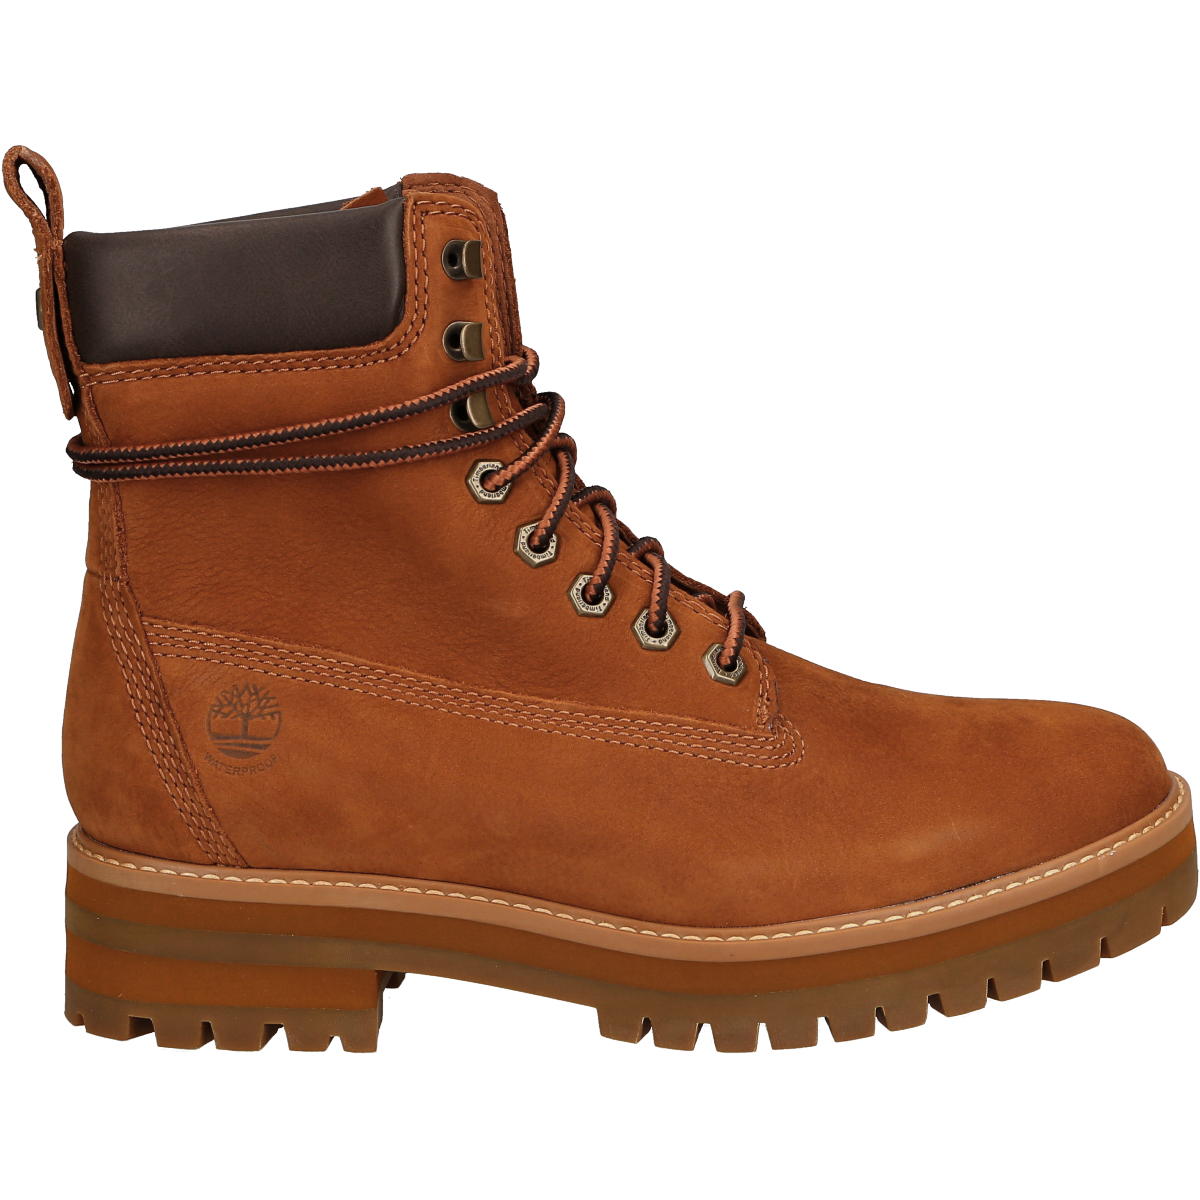 Timberland #A27Y8 Courma Herrenschuhe Boots im Schuhe Lüke